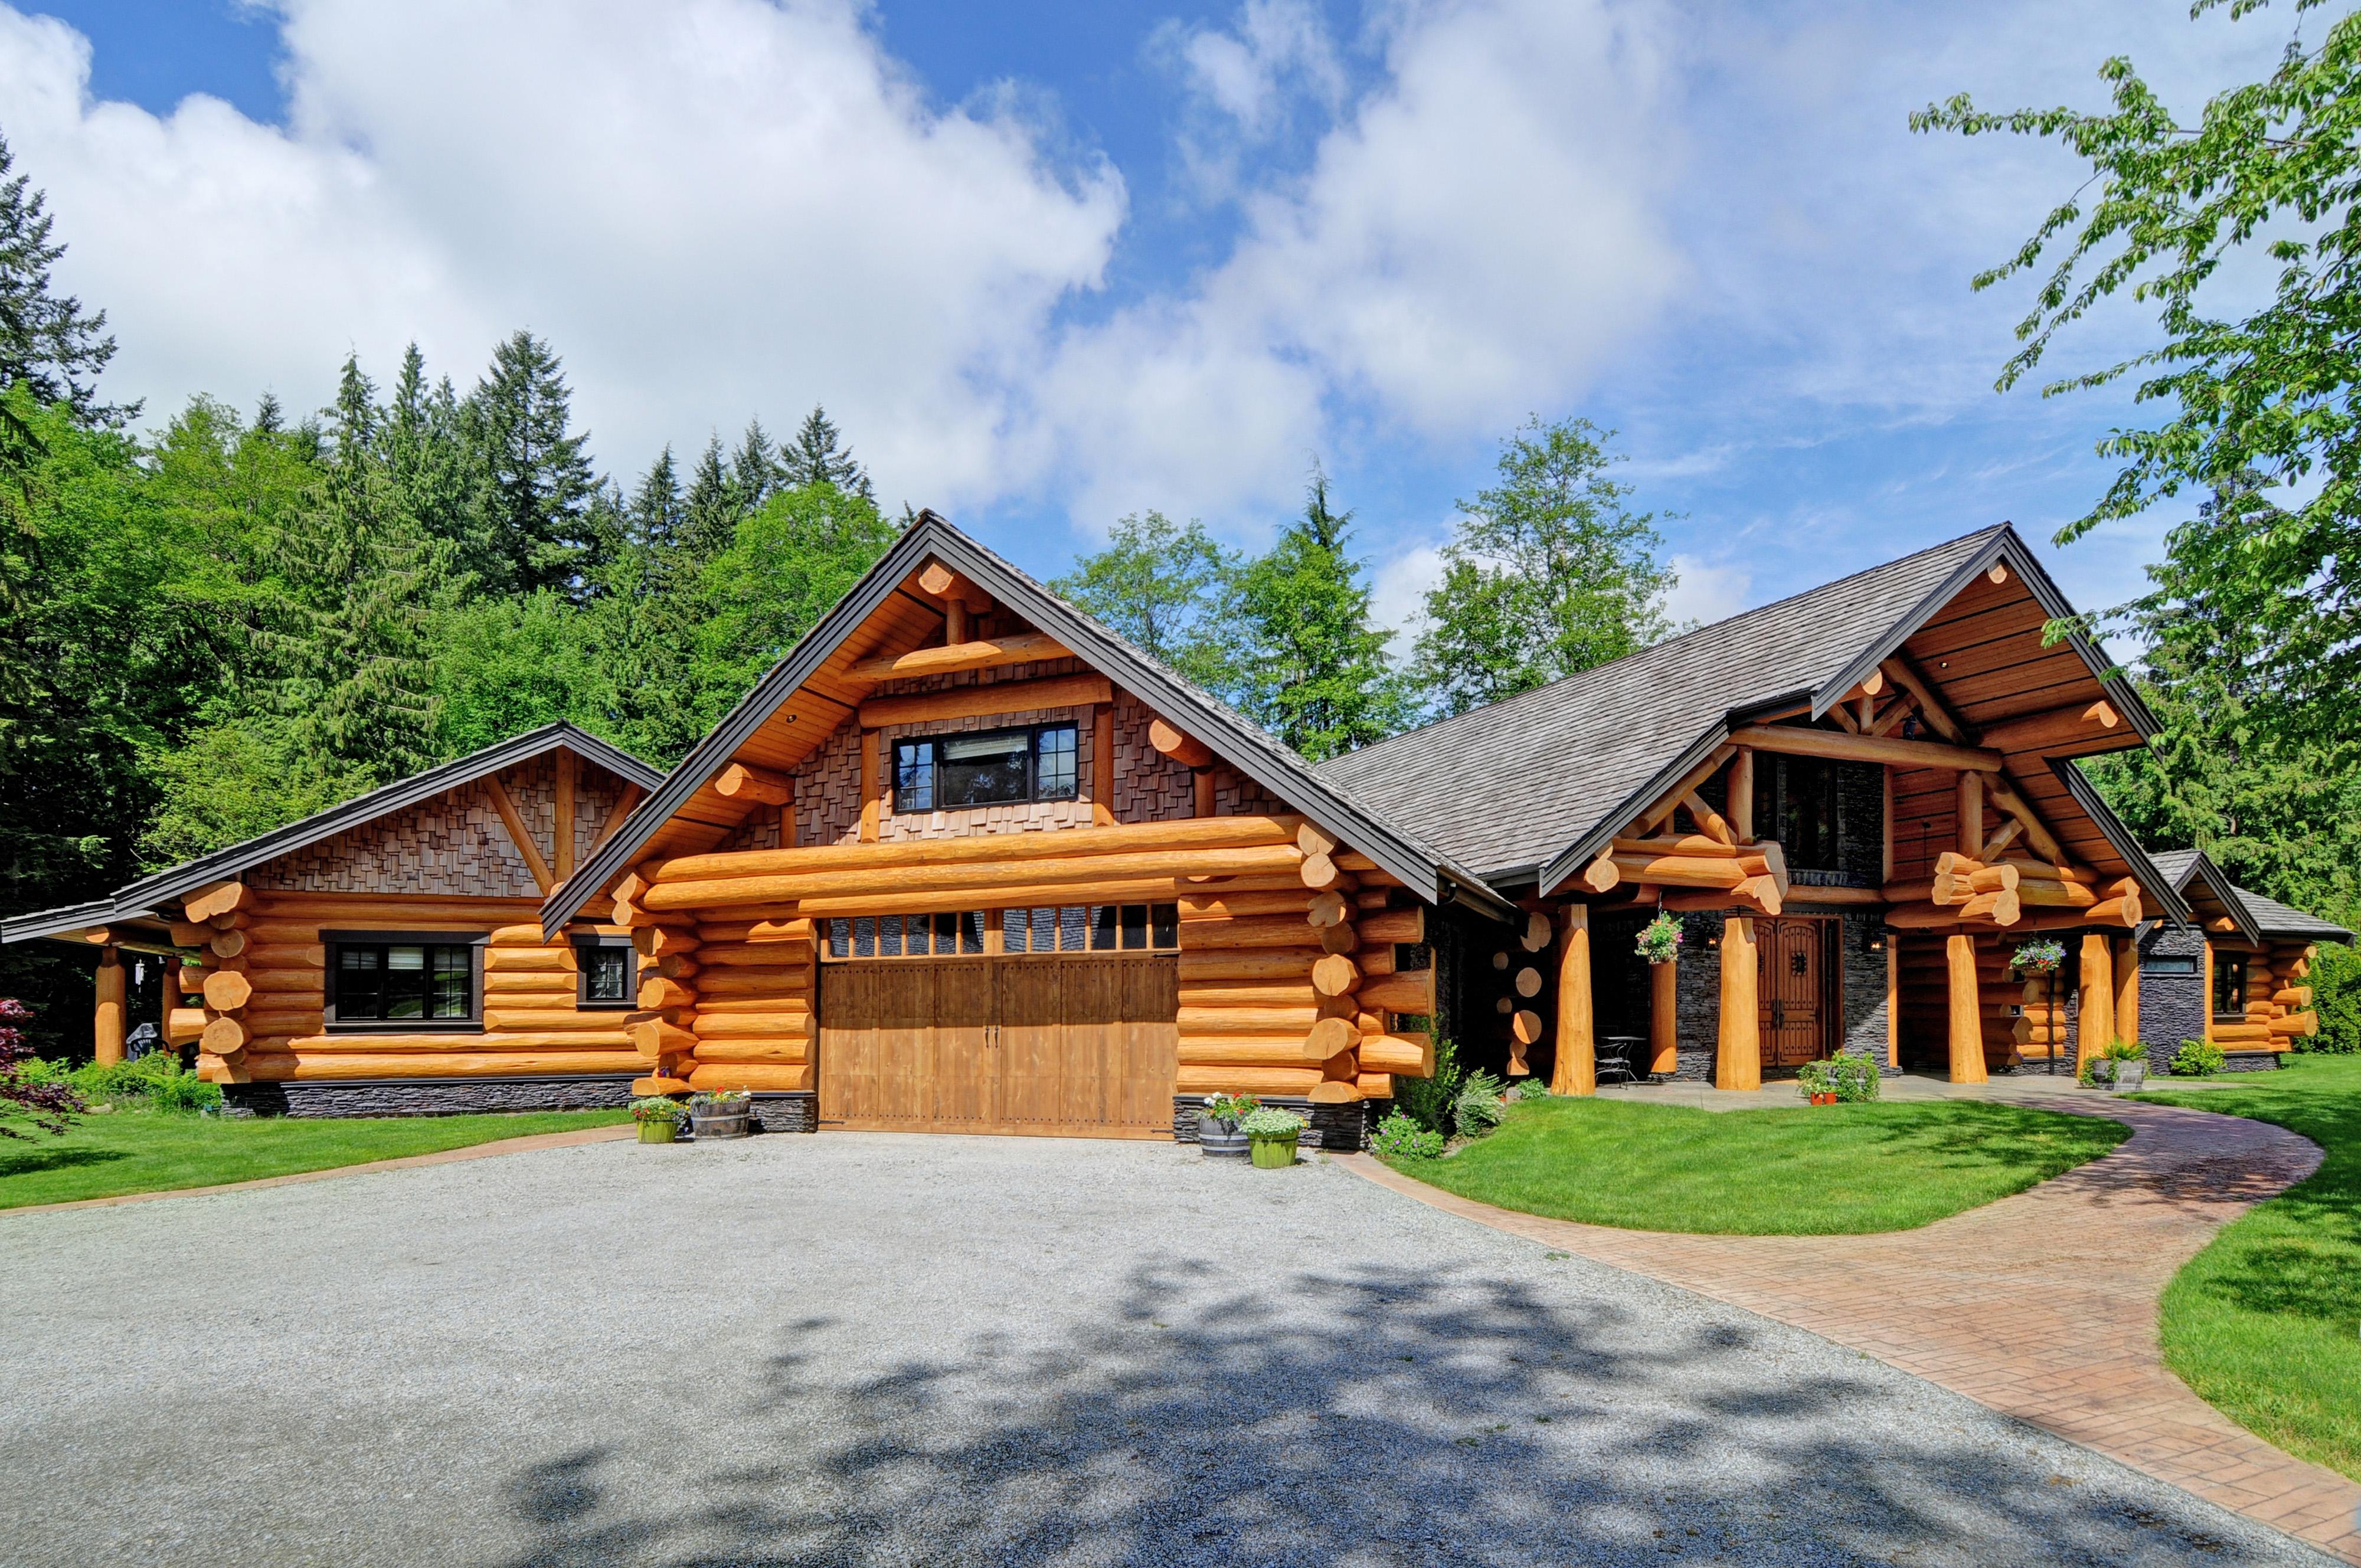 buck avroa ellijay cabins property lodge in valley ga